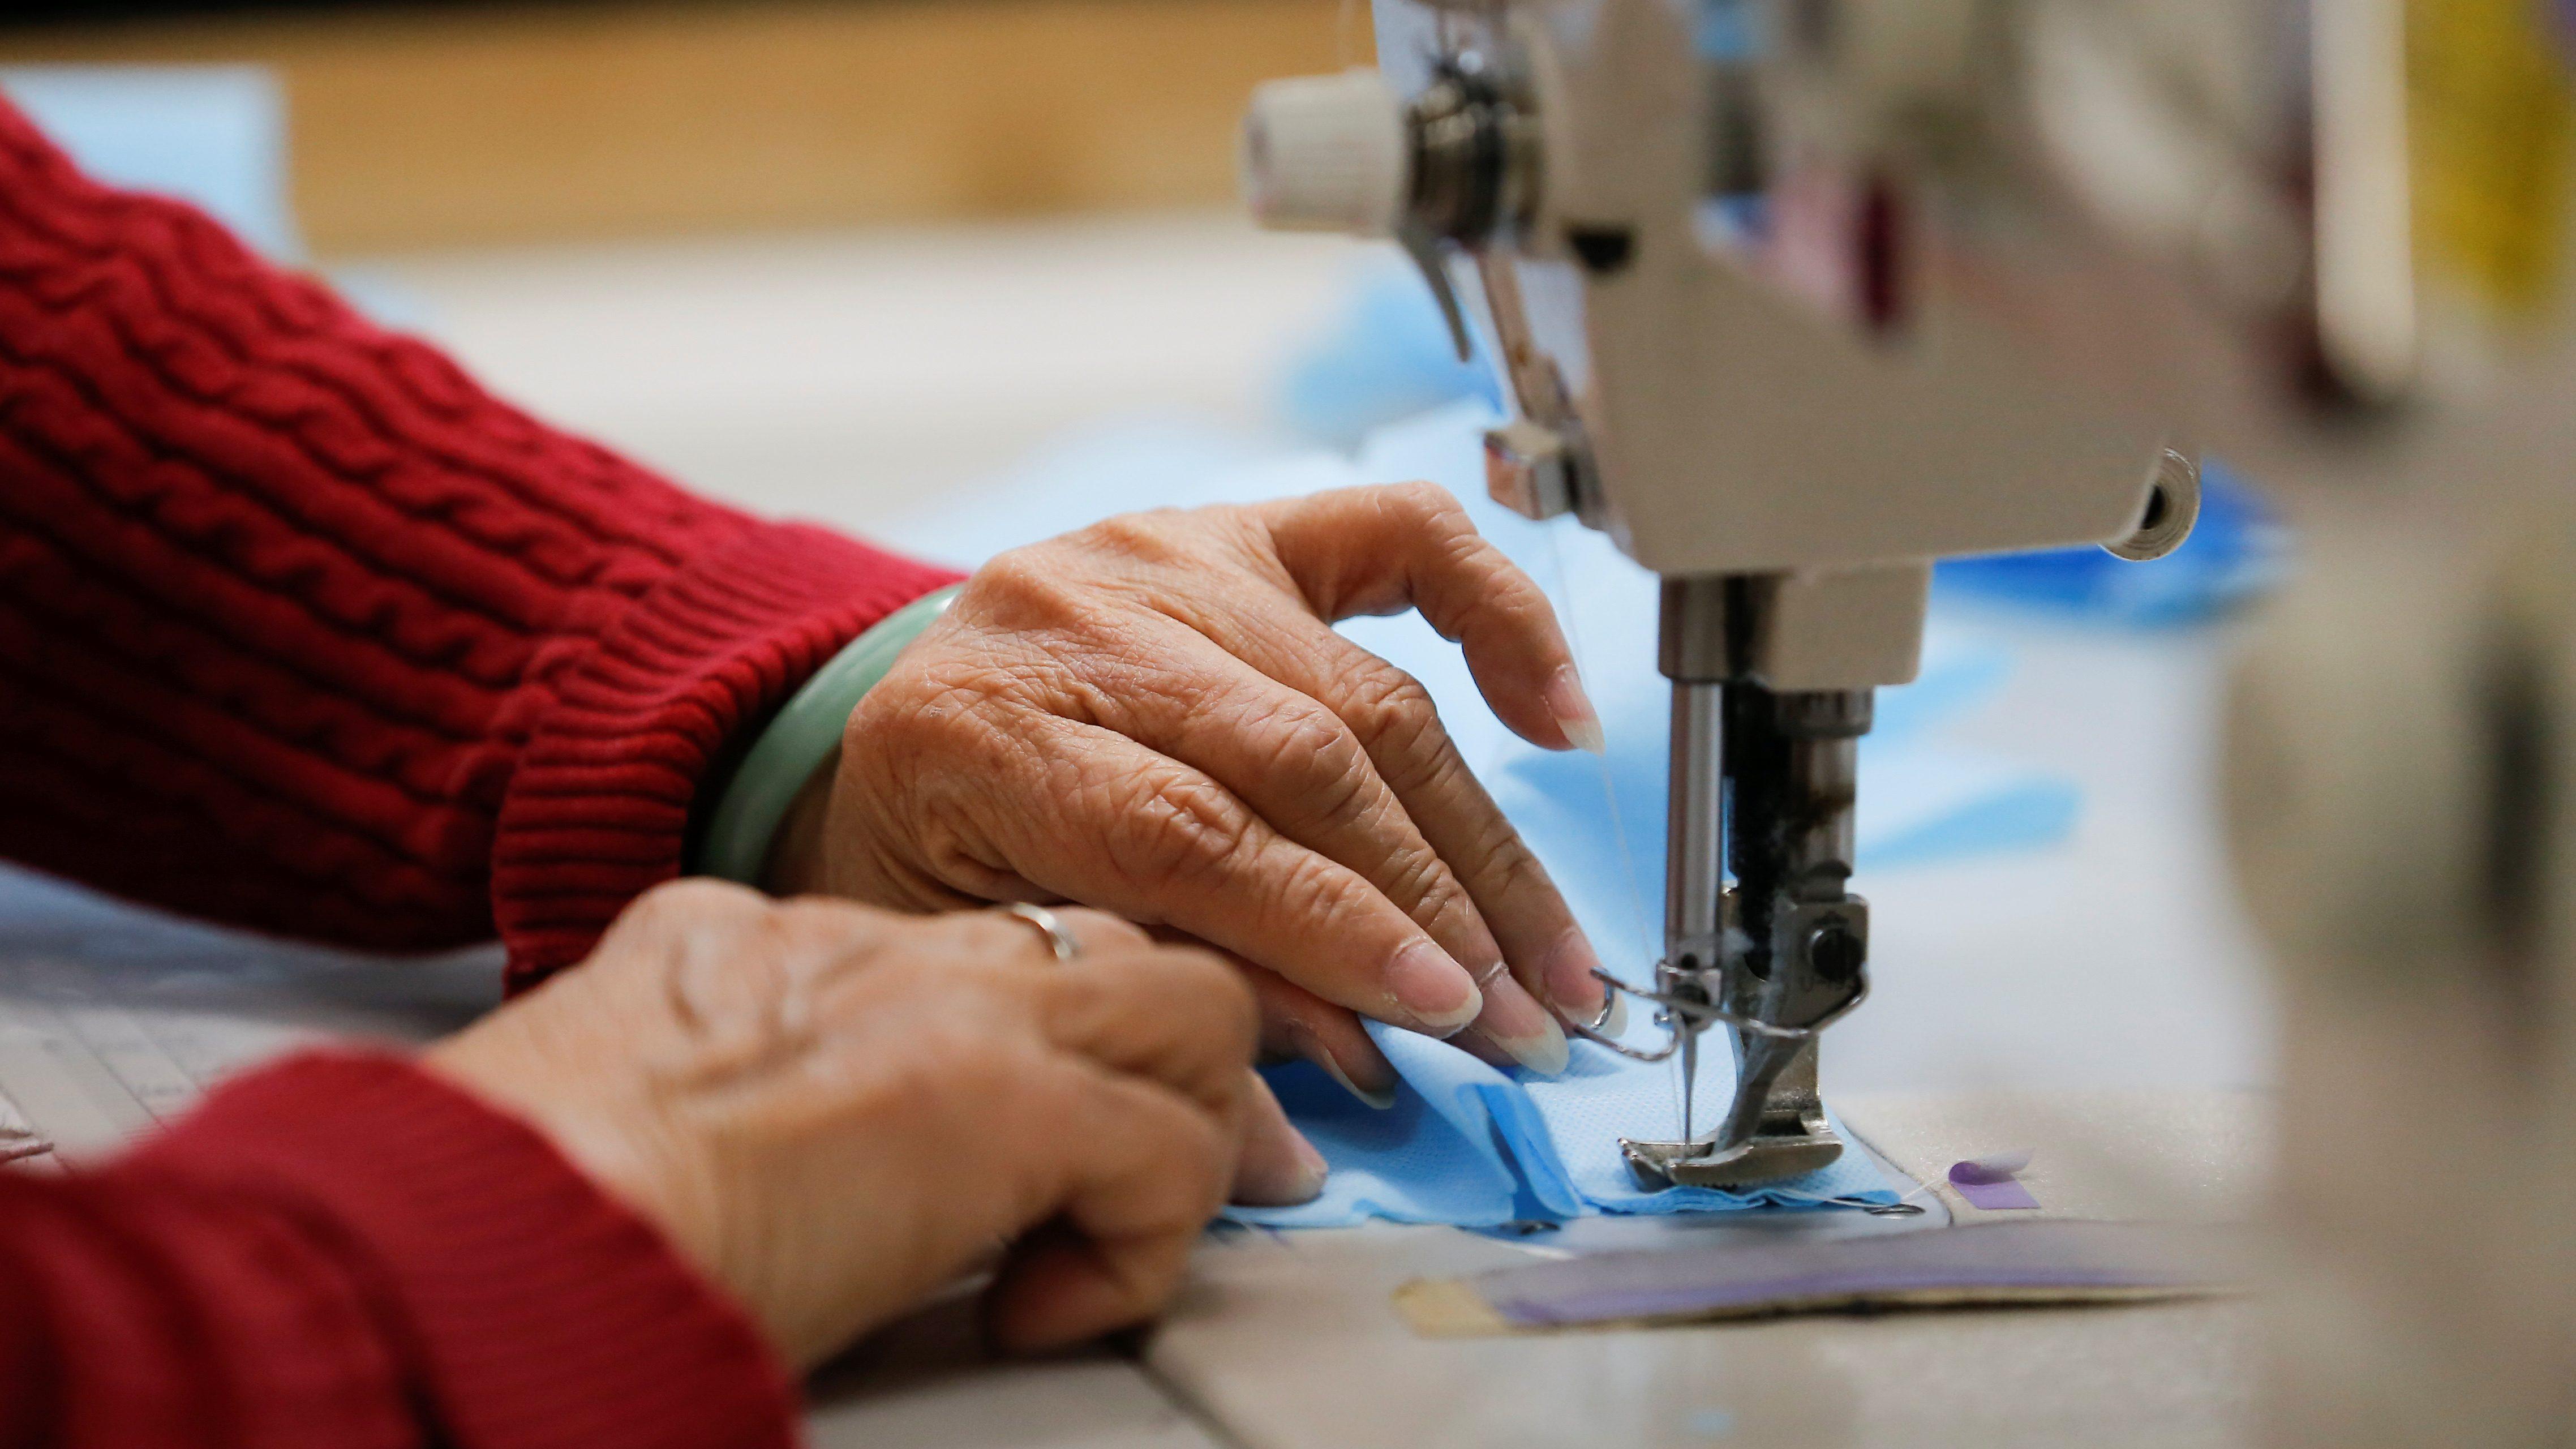 An employee sews masks at a clothing manufacturer